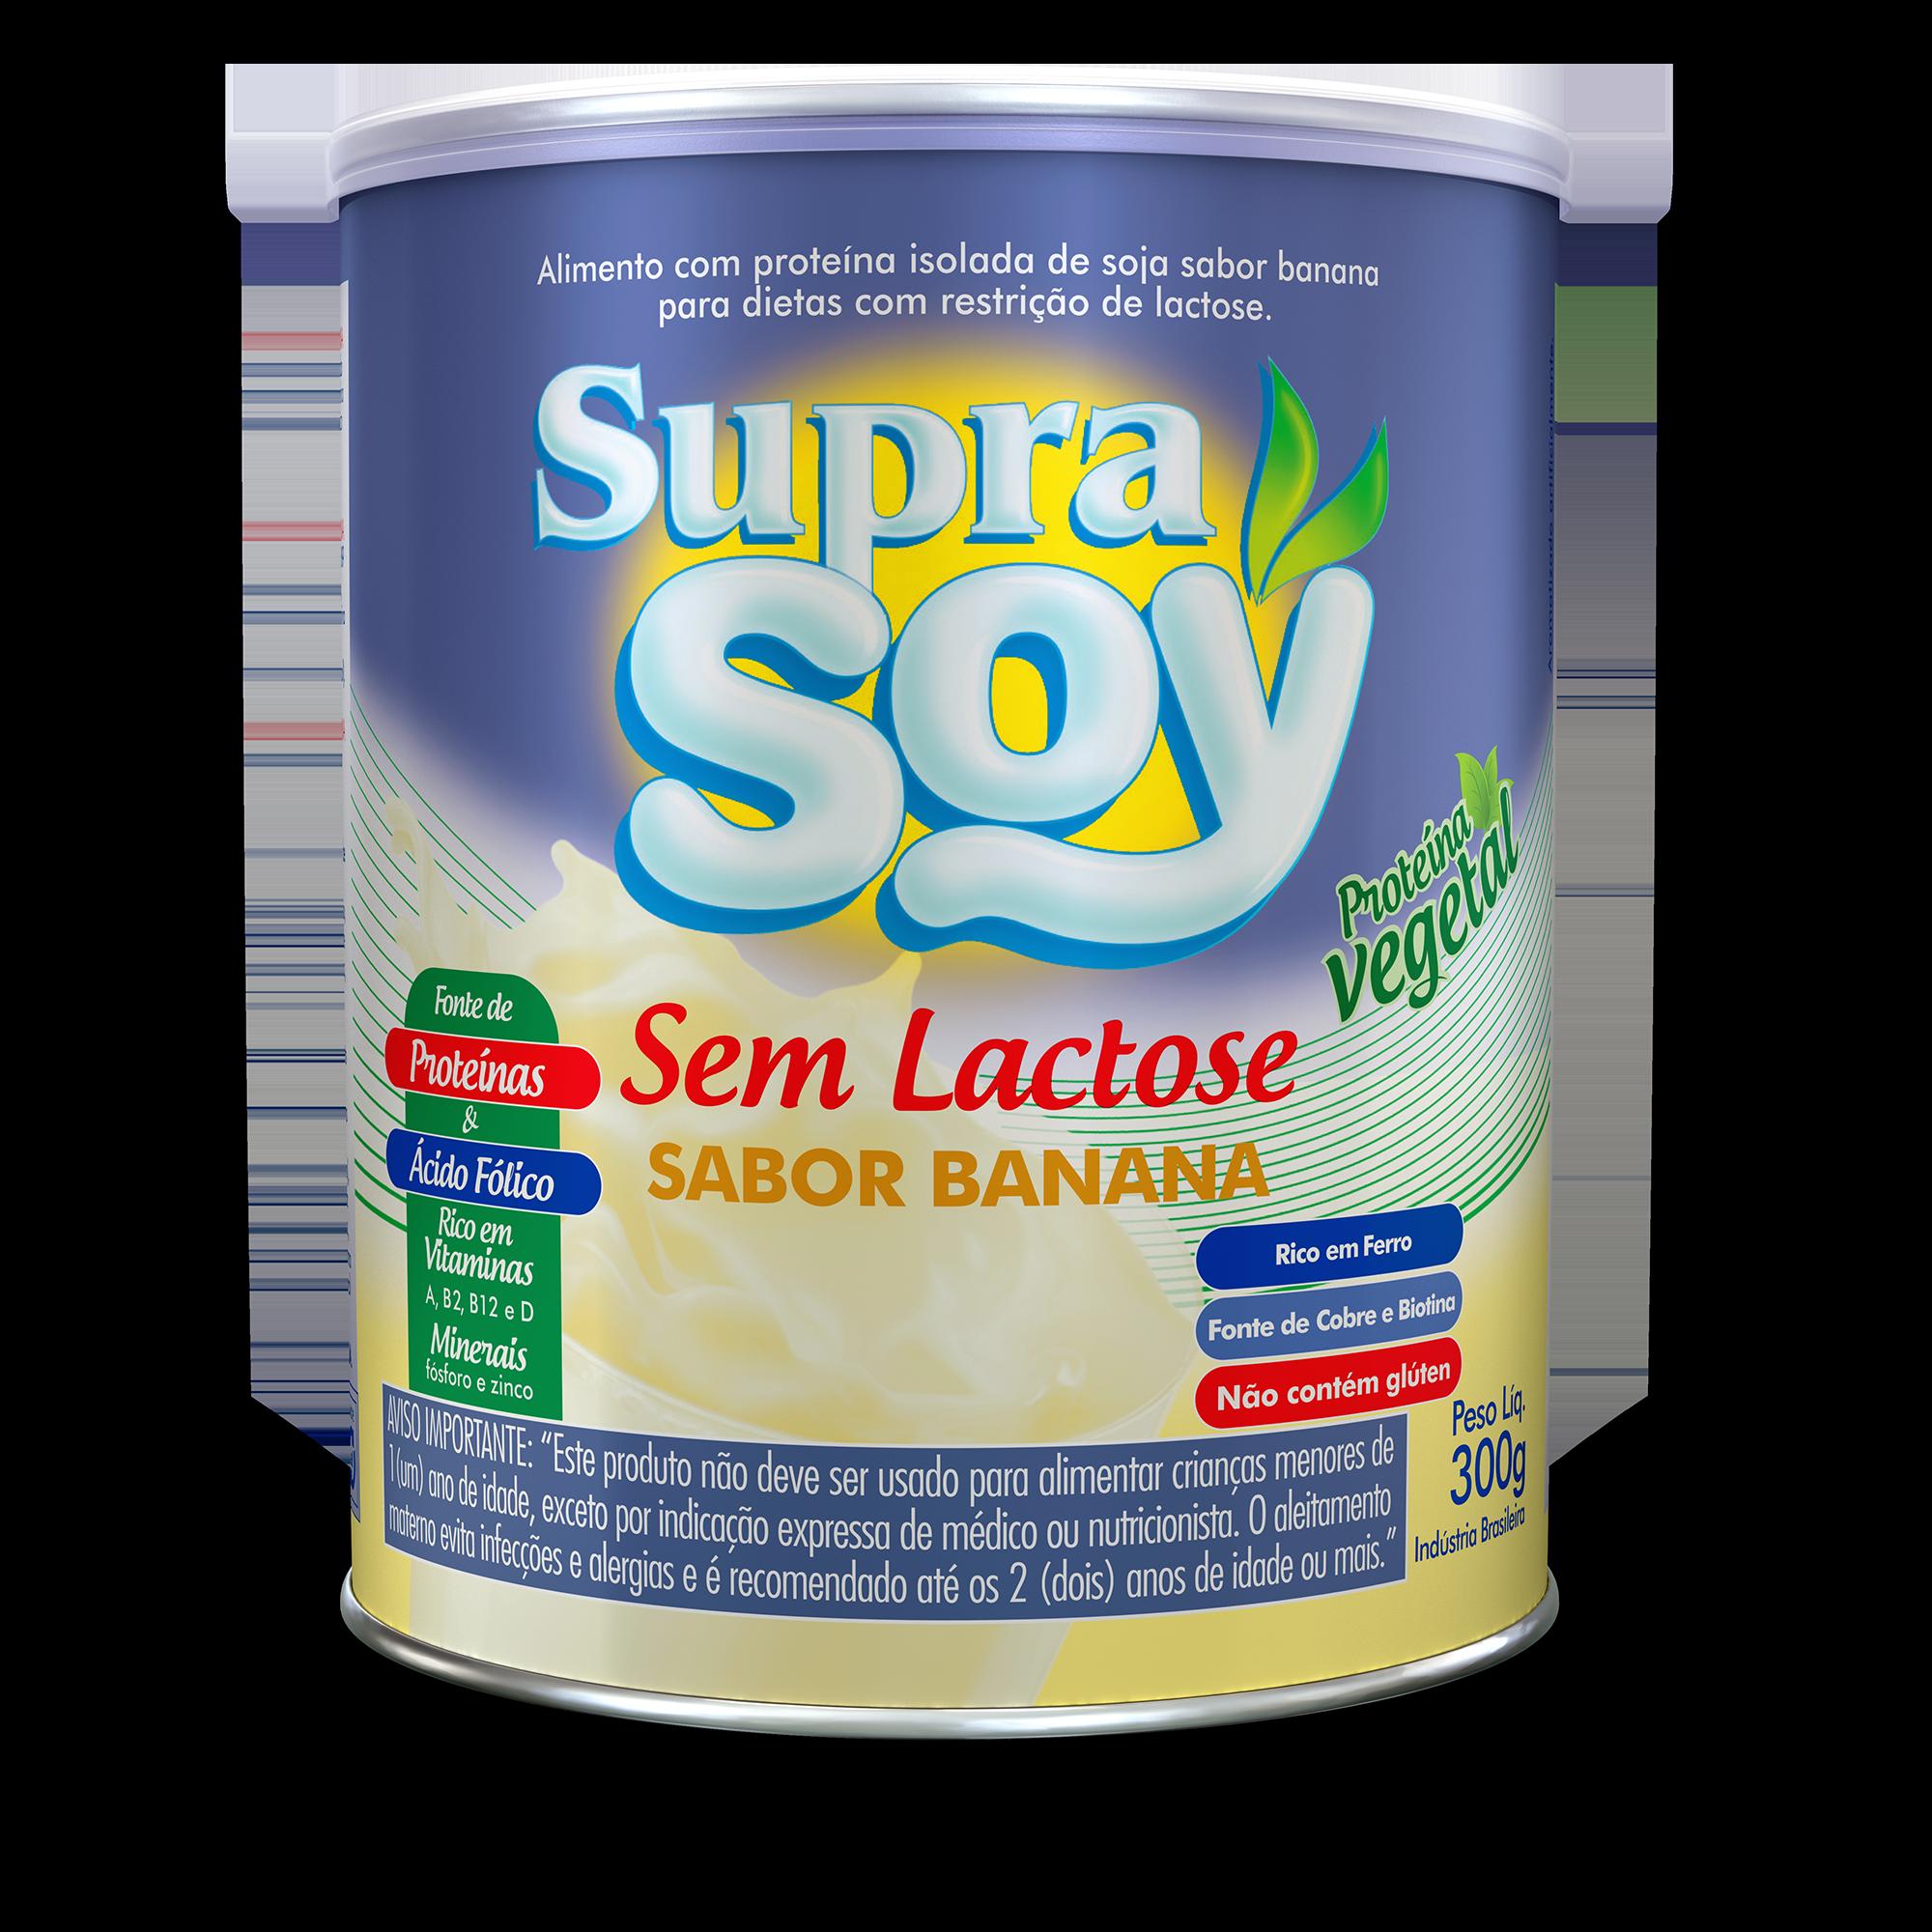 SupraSoy Sem Lactose Sabor Banana